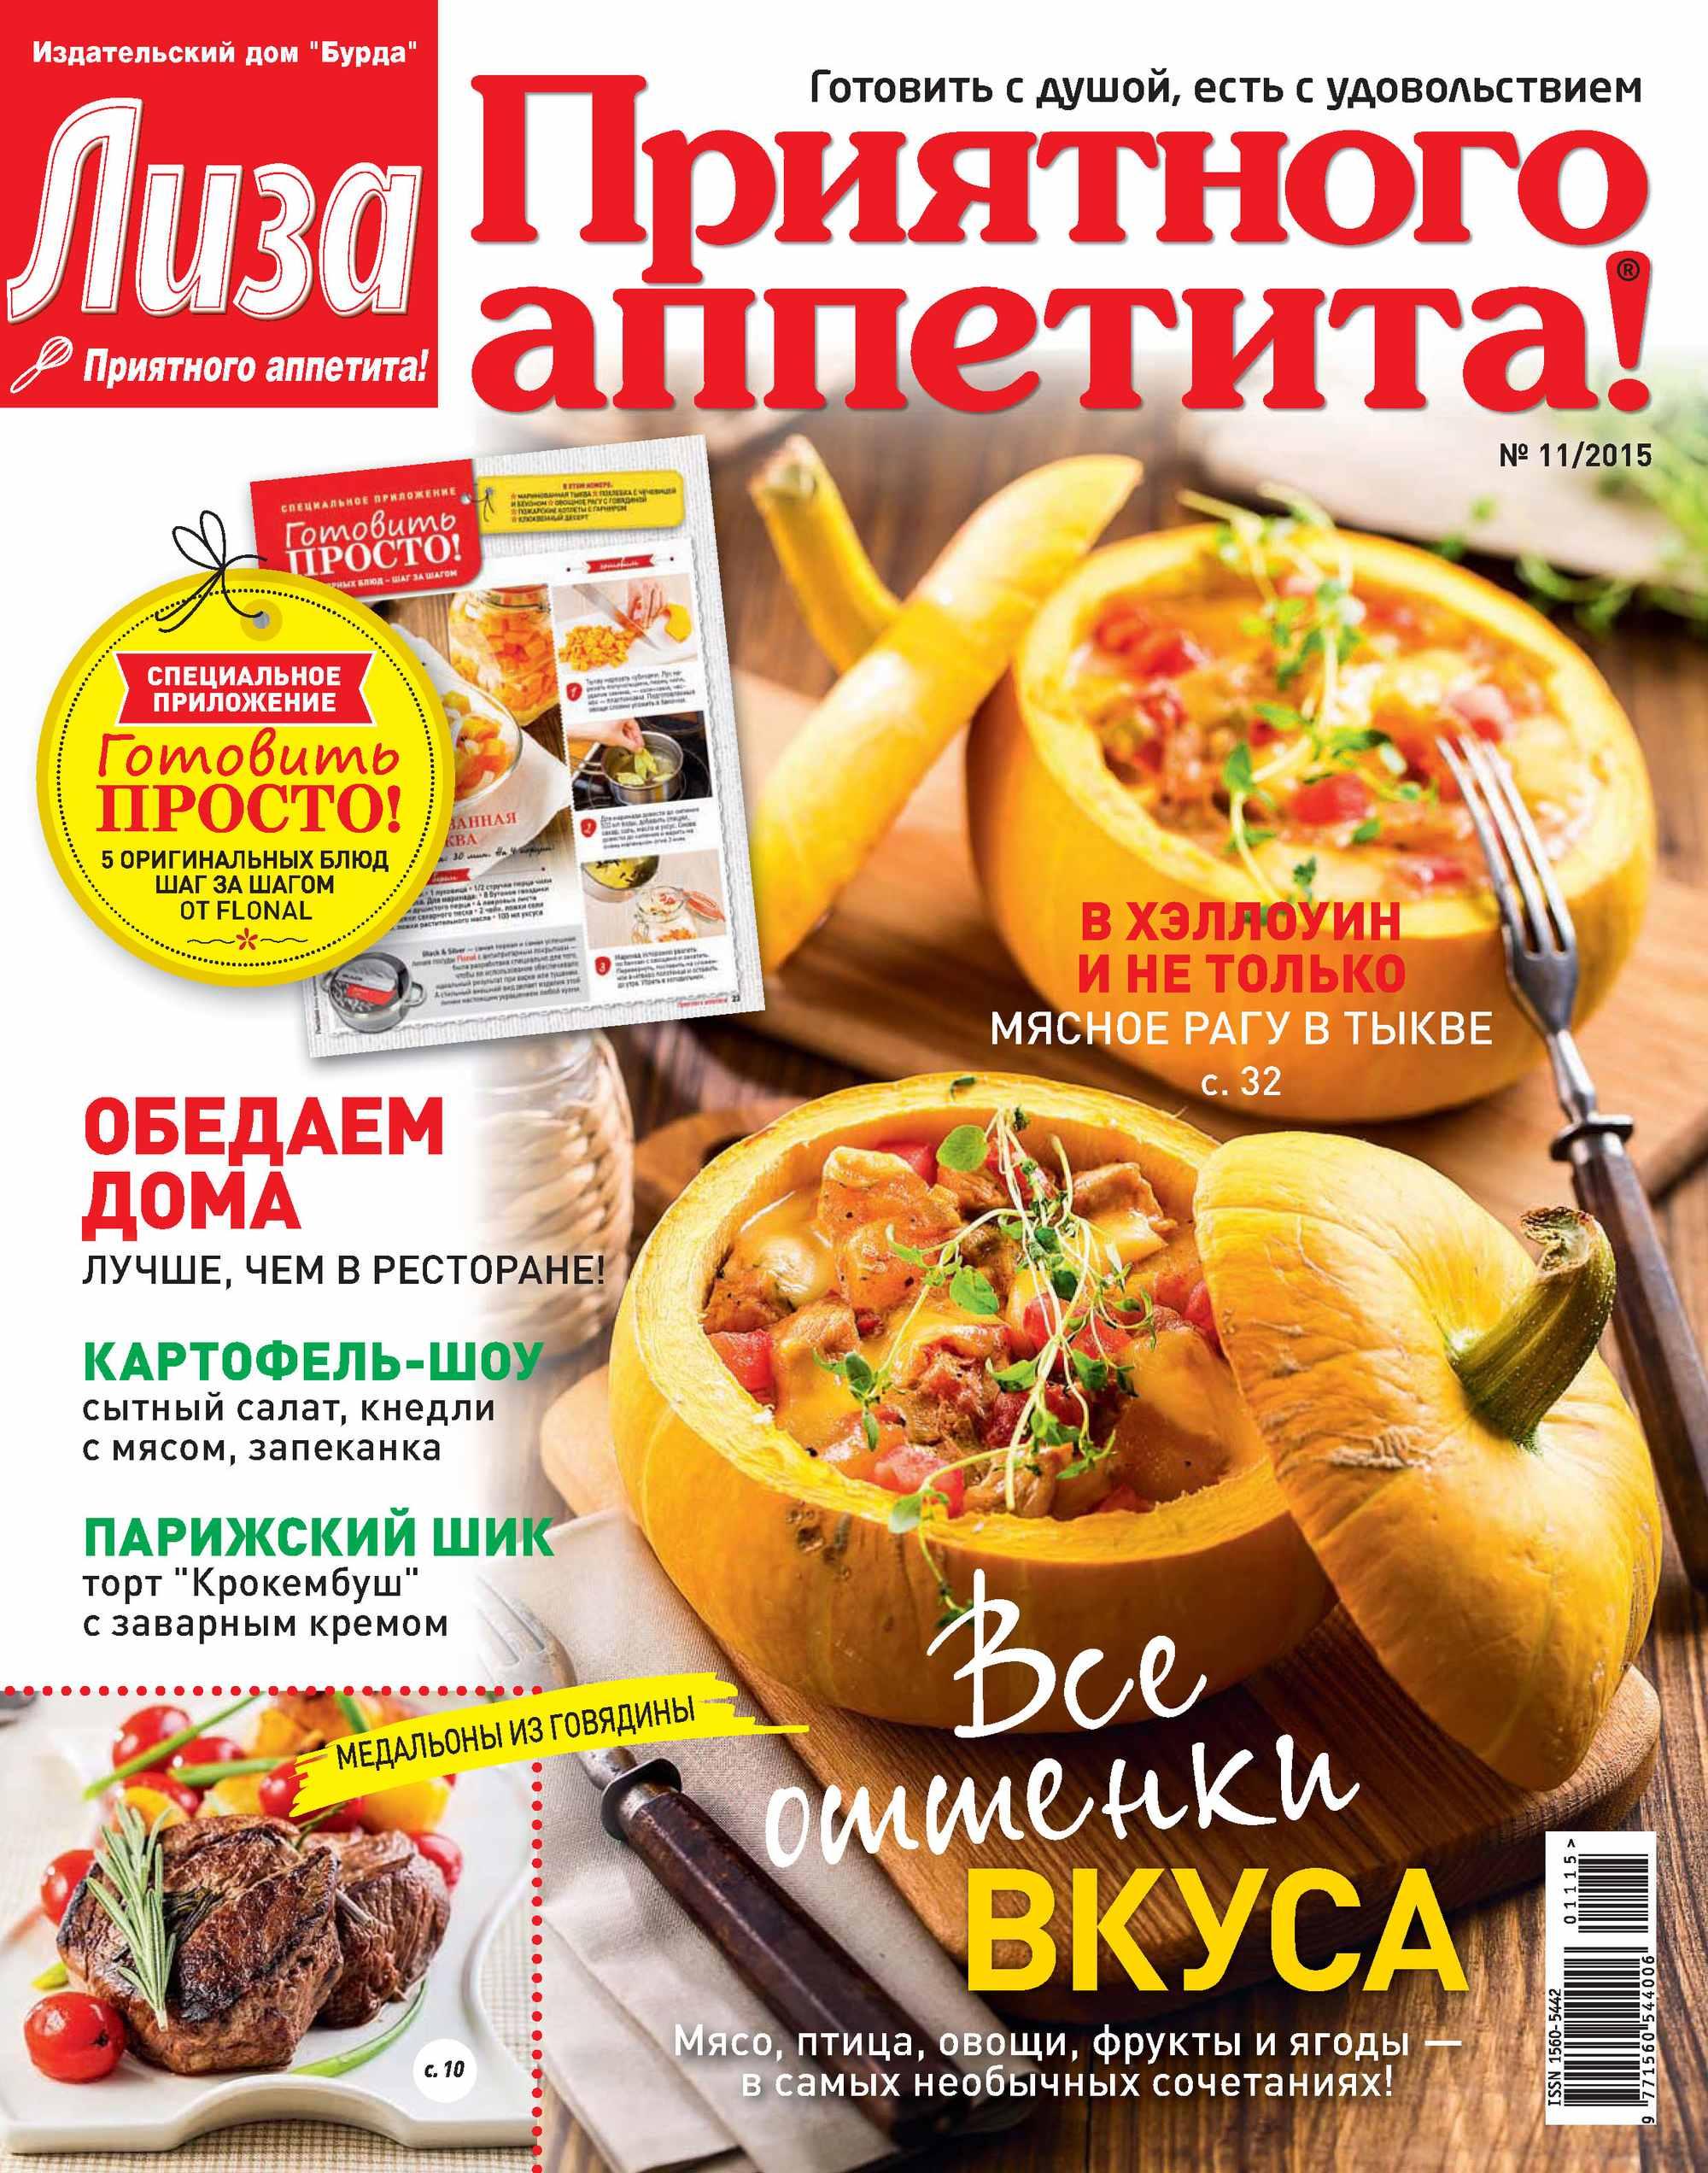 ИД «Бурда» Журнал «Лиза. Приятного аппетита» №11/2015 ид бурда журнал лиза приятного аппетита 04 2015